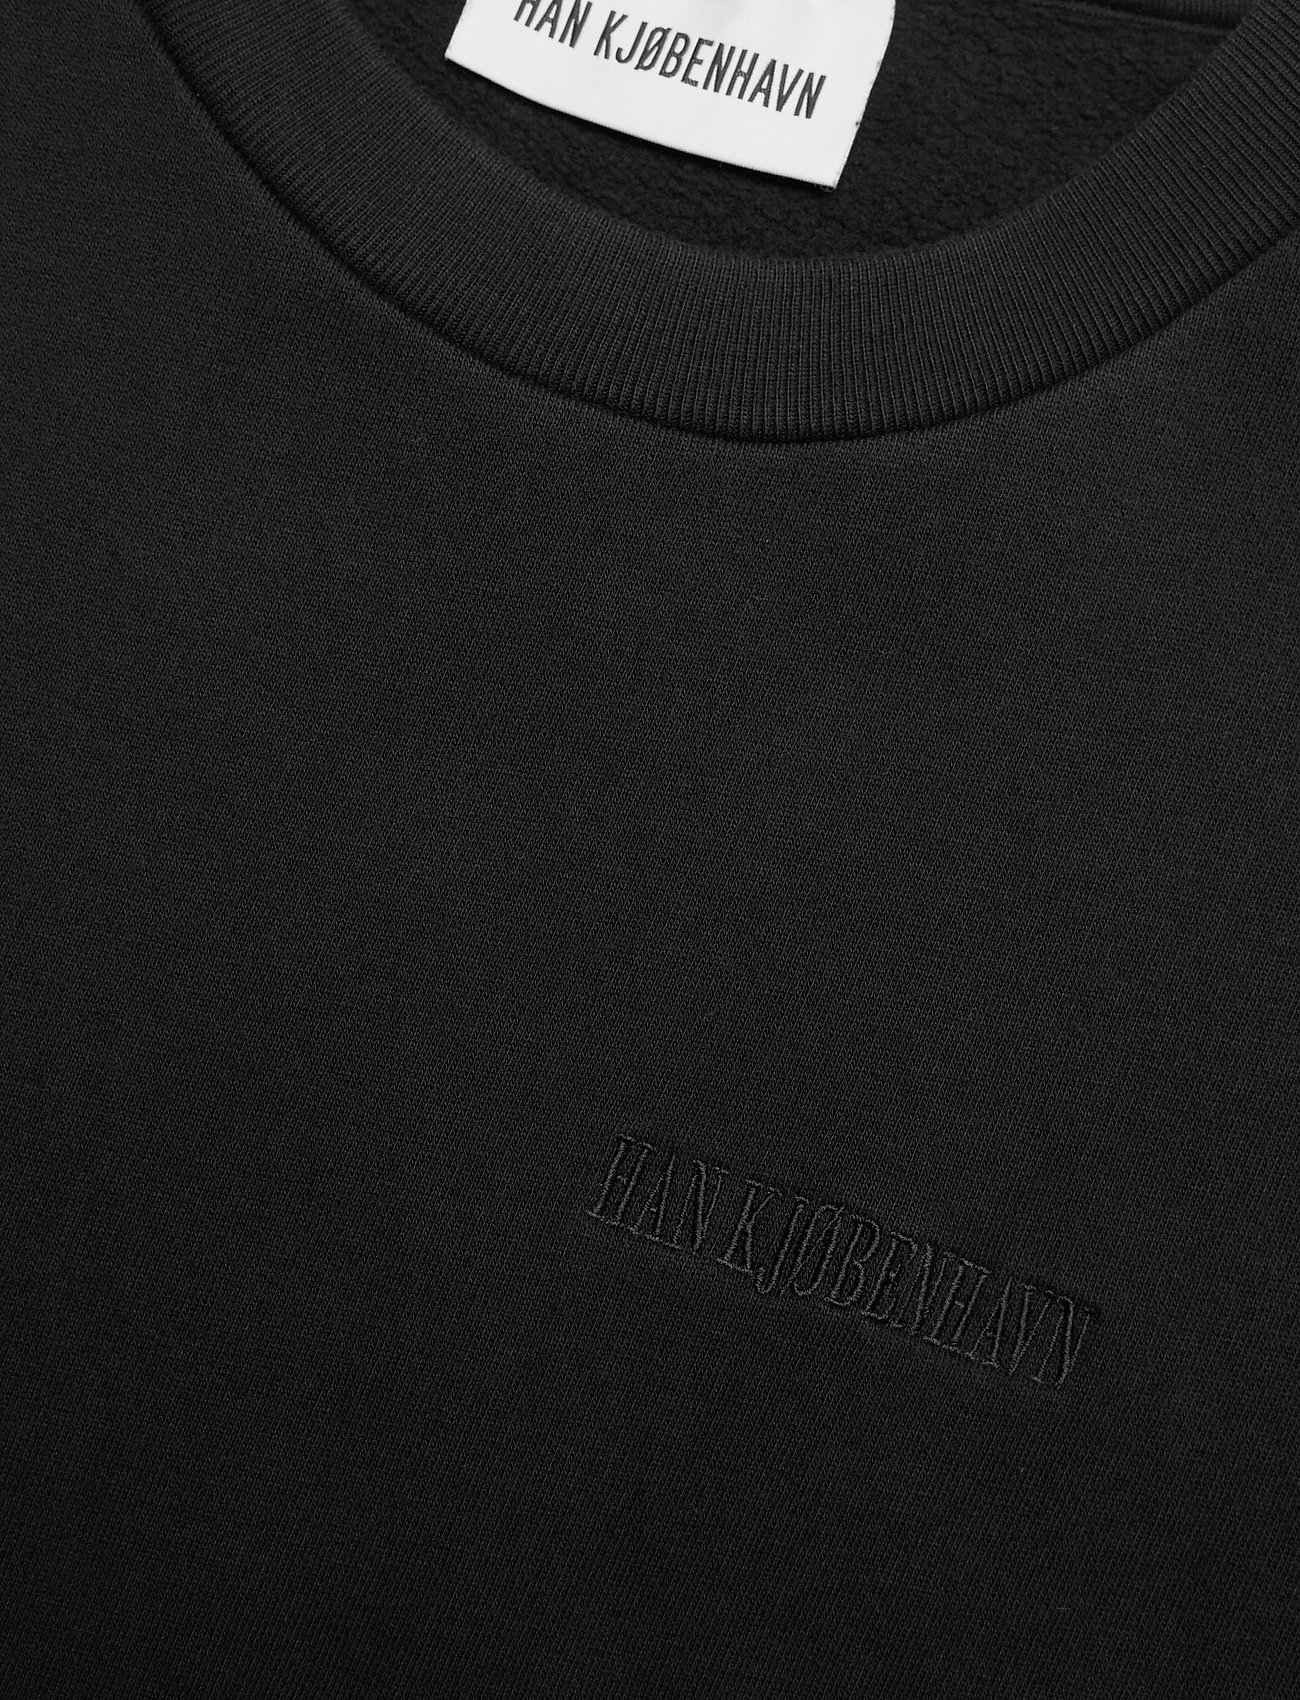 HAN Kjøbenhavn - Chunky Tee - basic t-shirts - faded black - 5